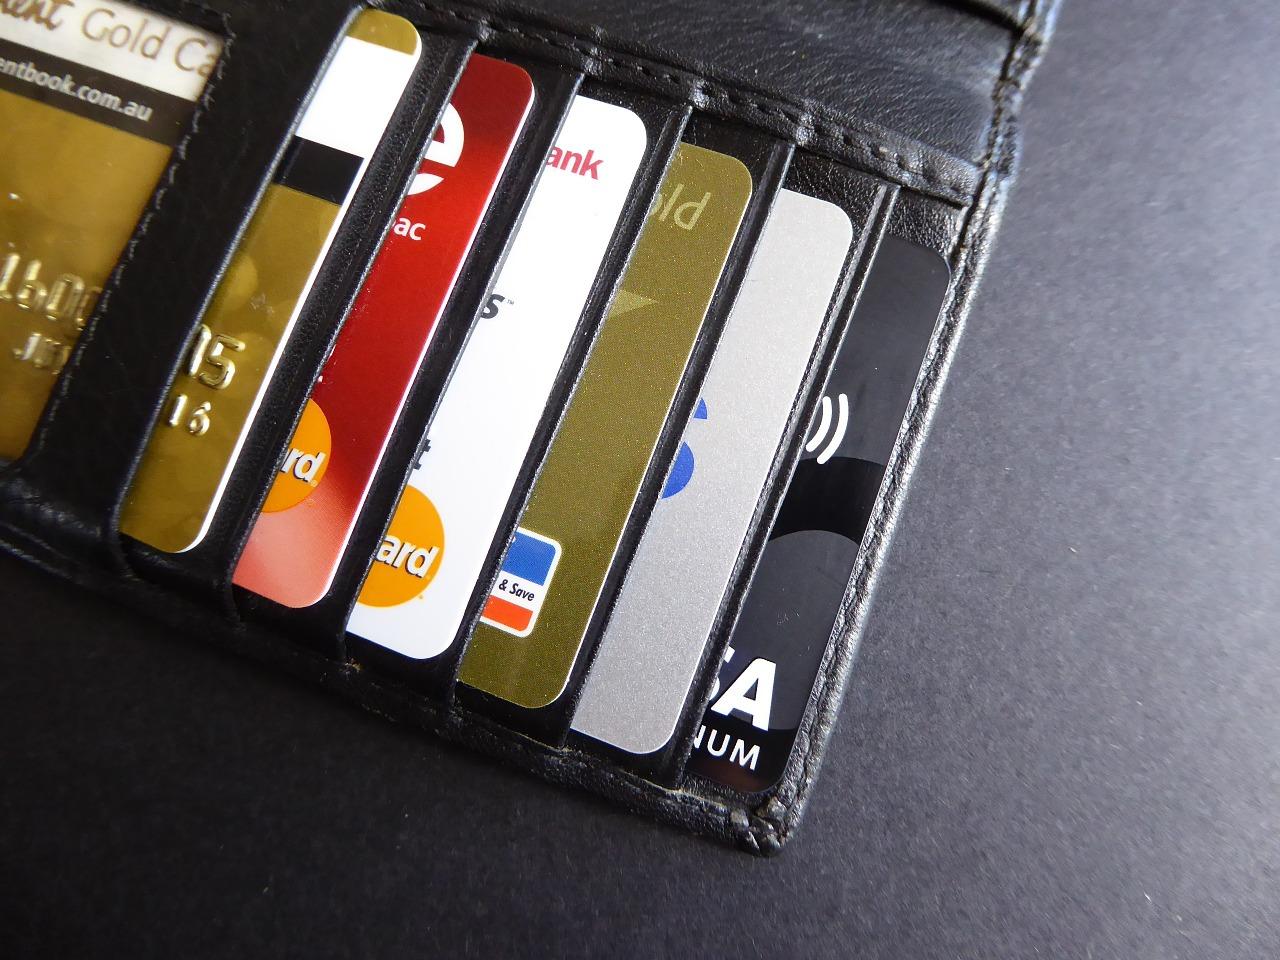 Die Besten Kreditkarten